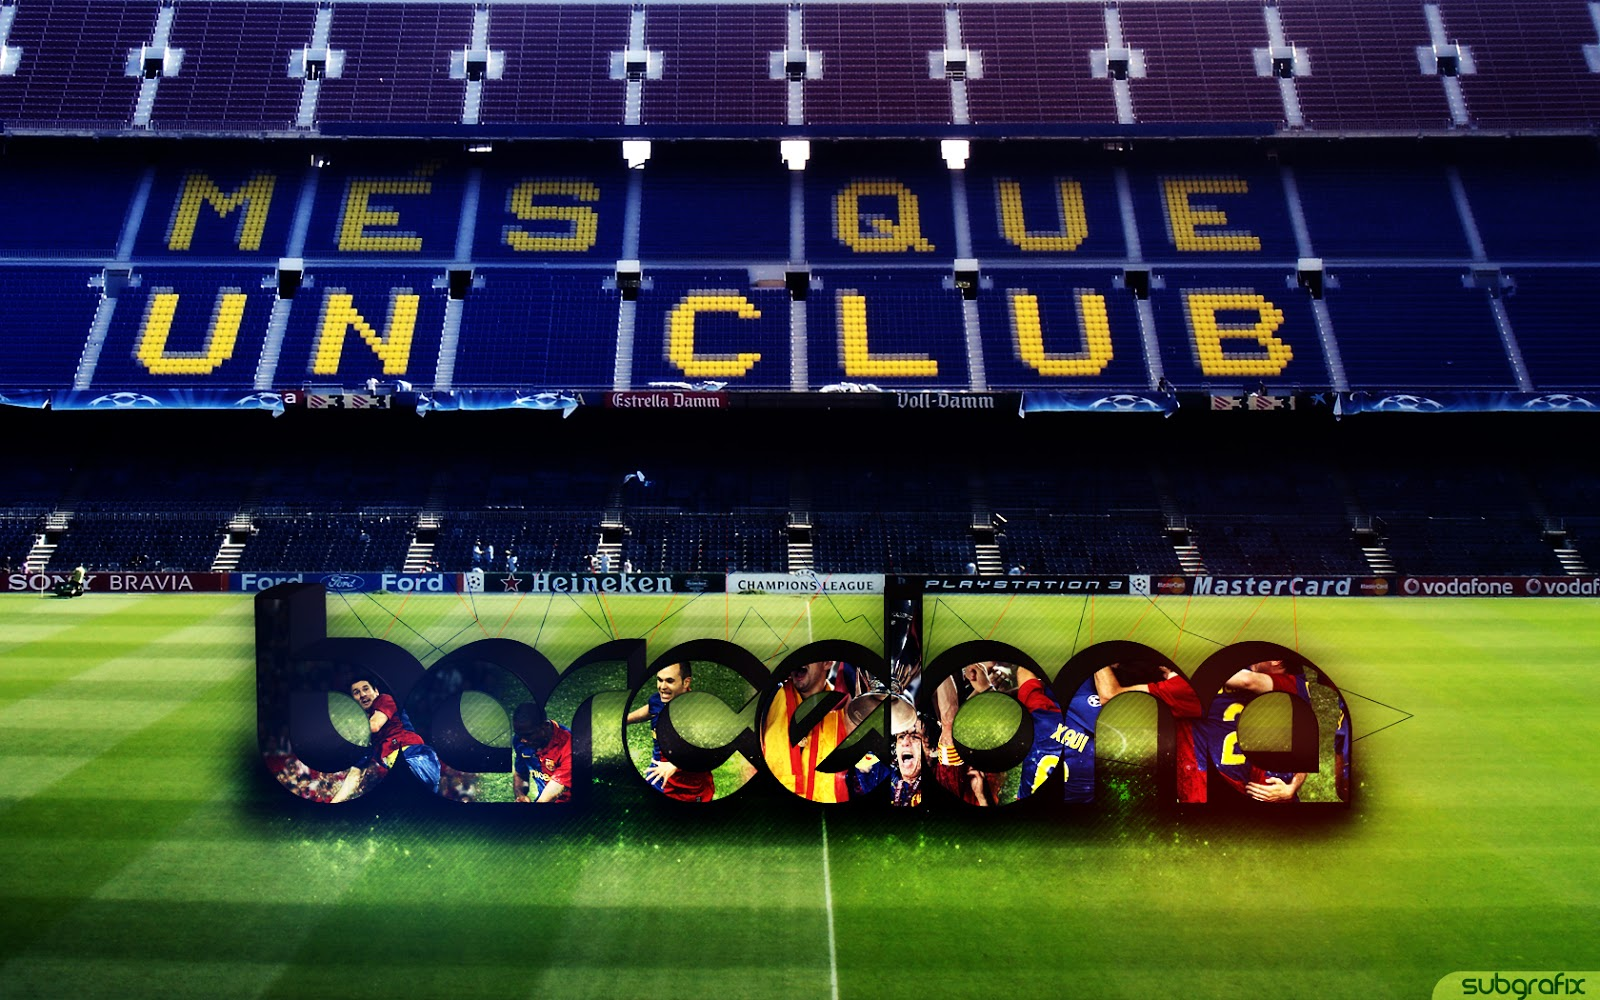 http://2.bp.blogspot.com/-PAbcDG4Ng9c/UWlMC7XO2AI/AAAAAAAAFpc/y70vdxdCim0/s1600/Stadium-FC-Barcelona-Widescreen.jpg